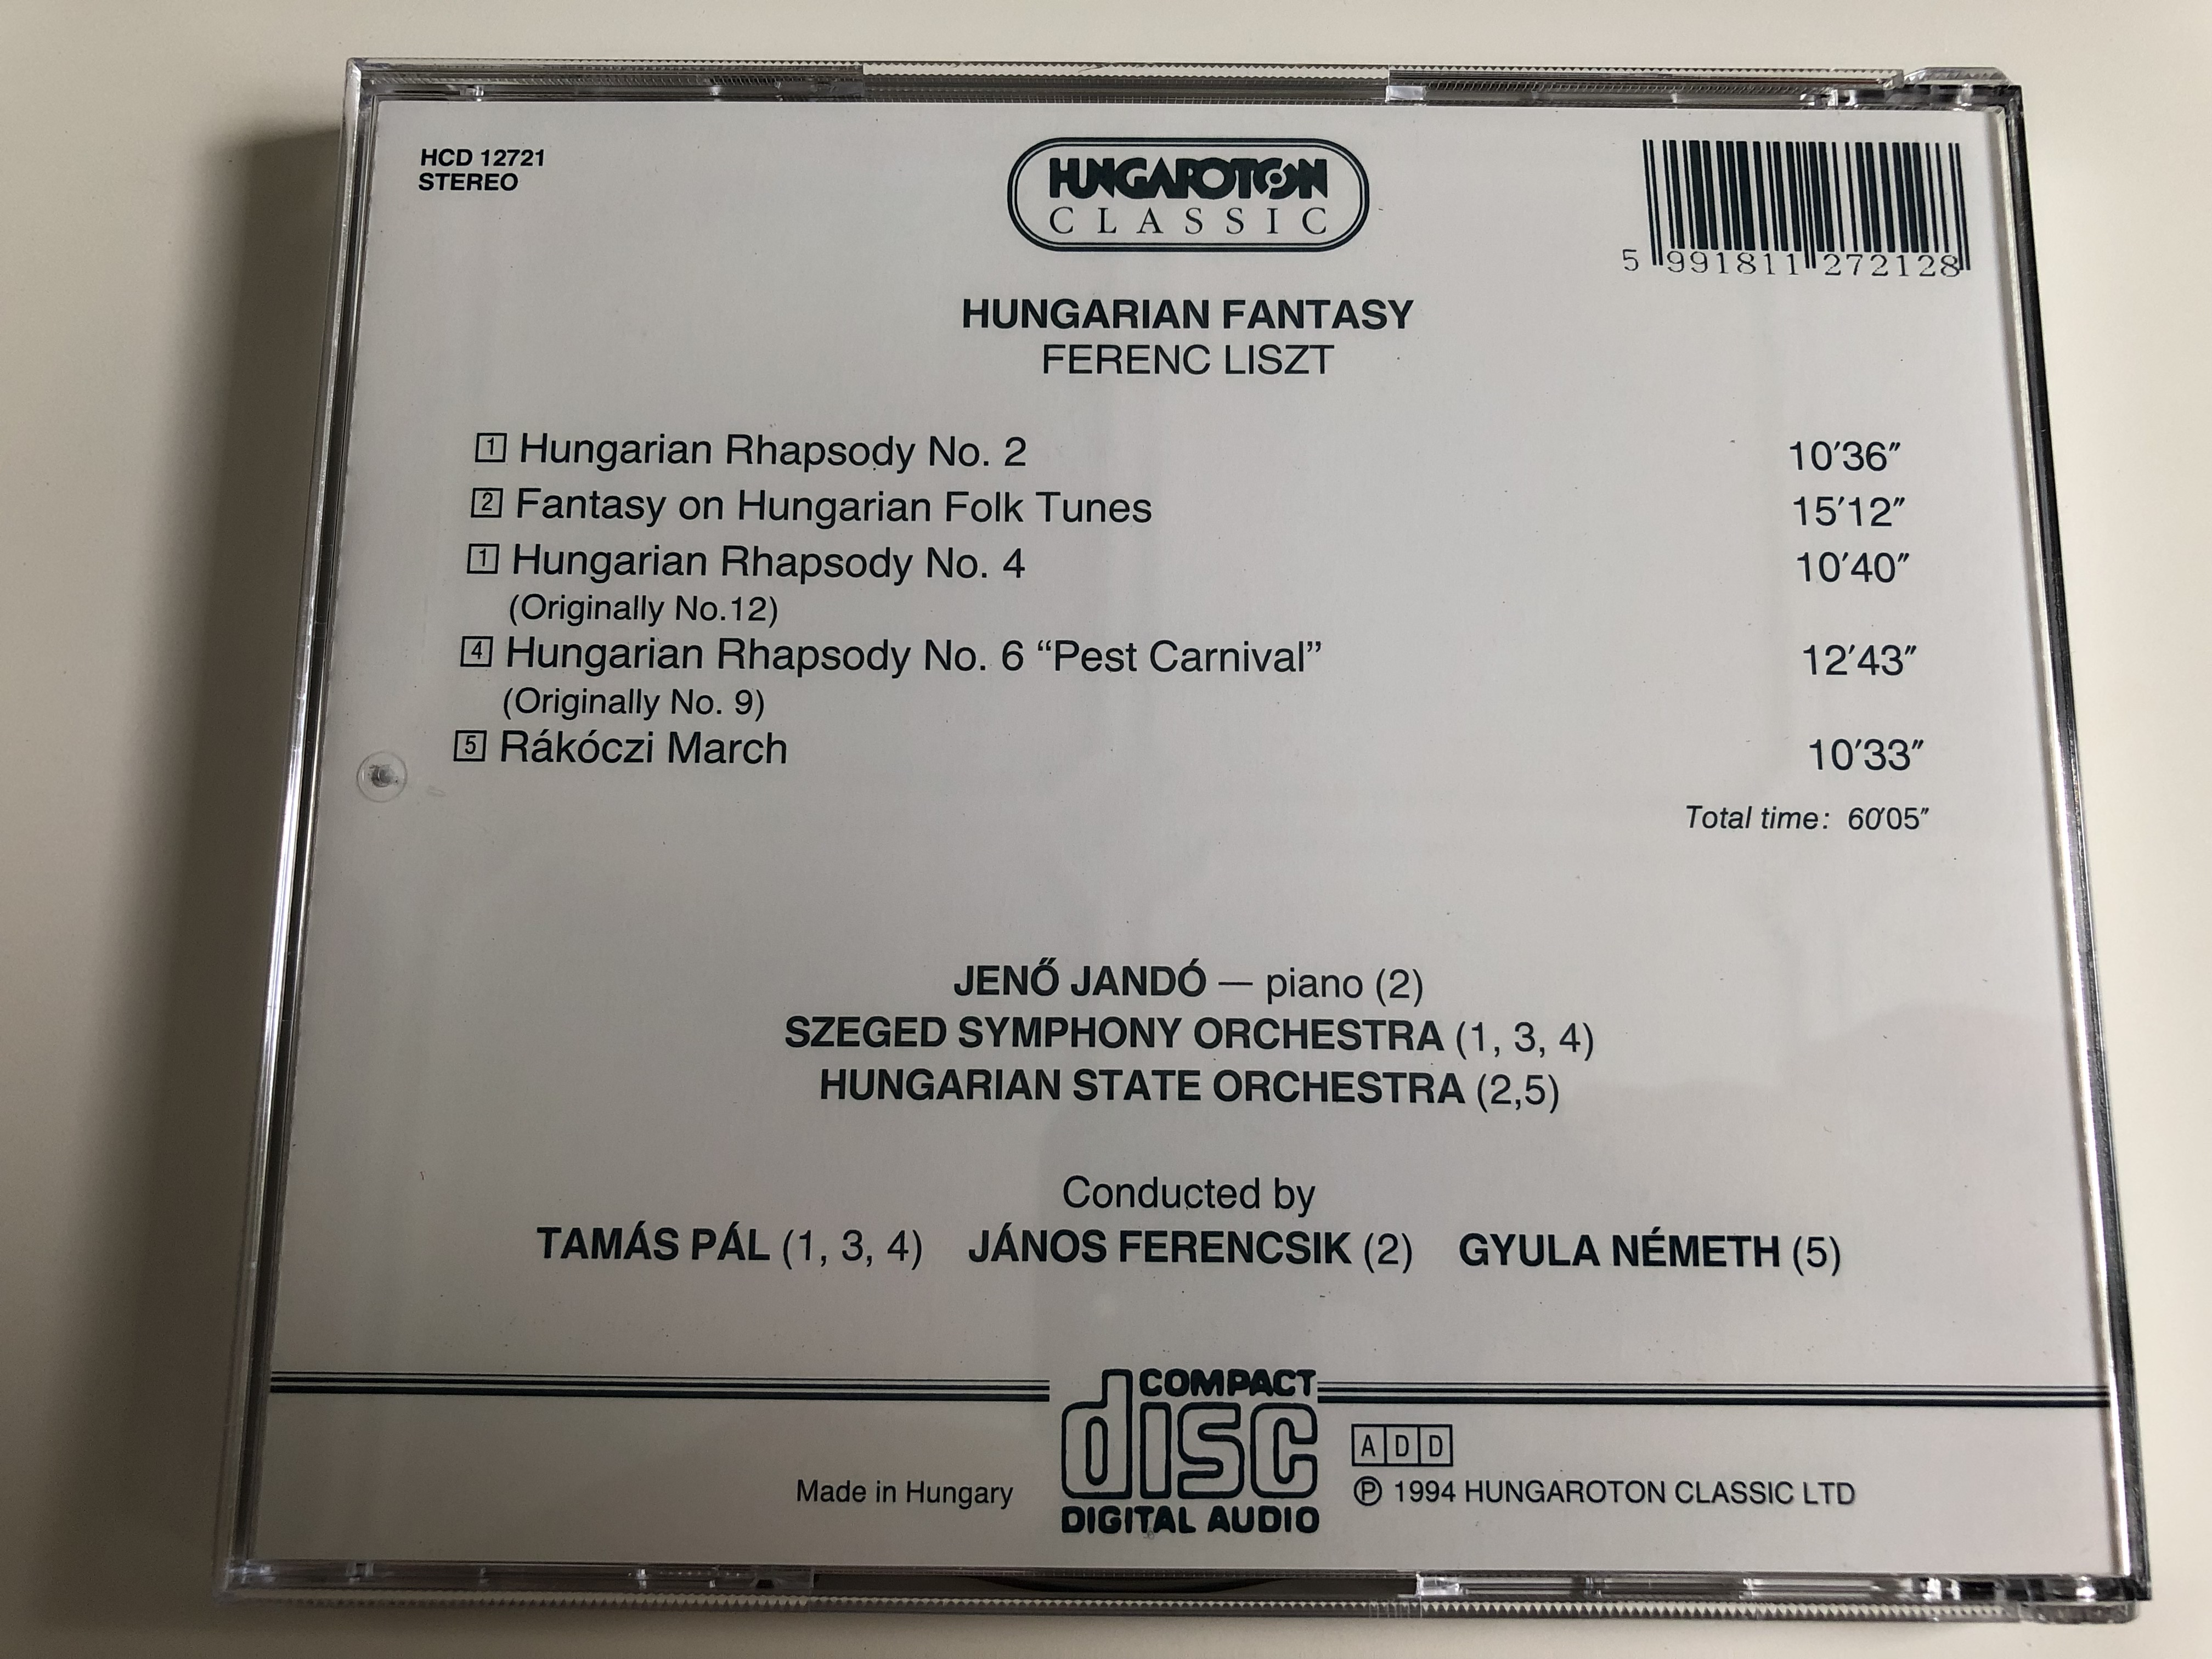 liszt-hungarian-fantasy-orchestral-favourites-szeged-symphony-orchestra-hungarian-state-orchestra-jen-jand-piano-6-.jpg